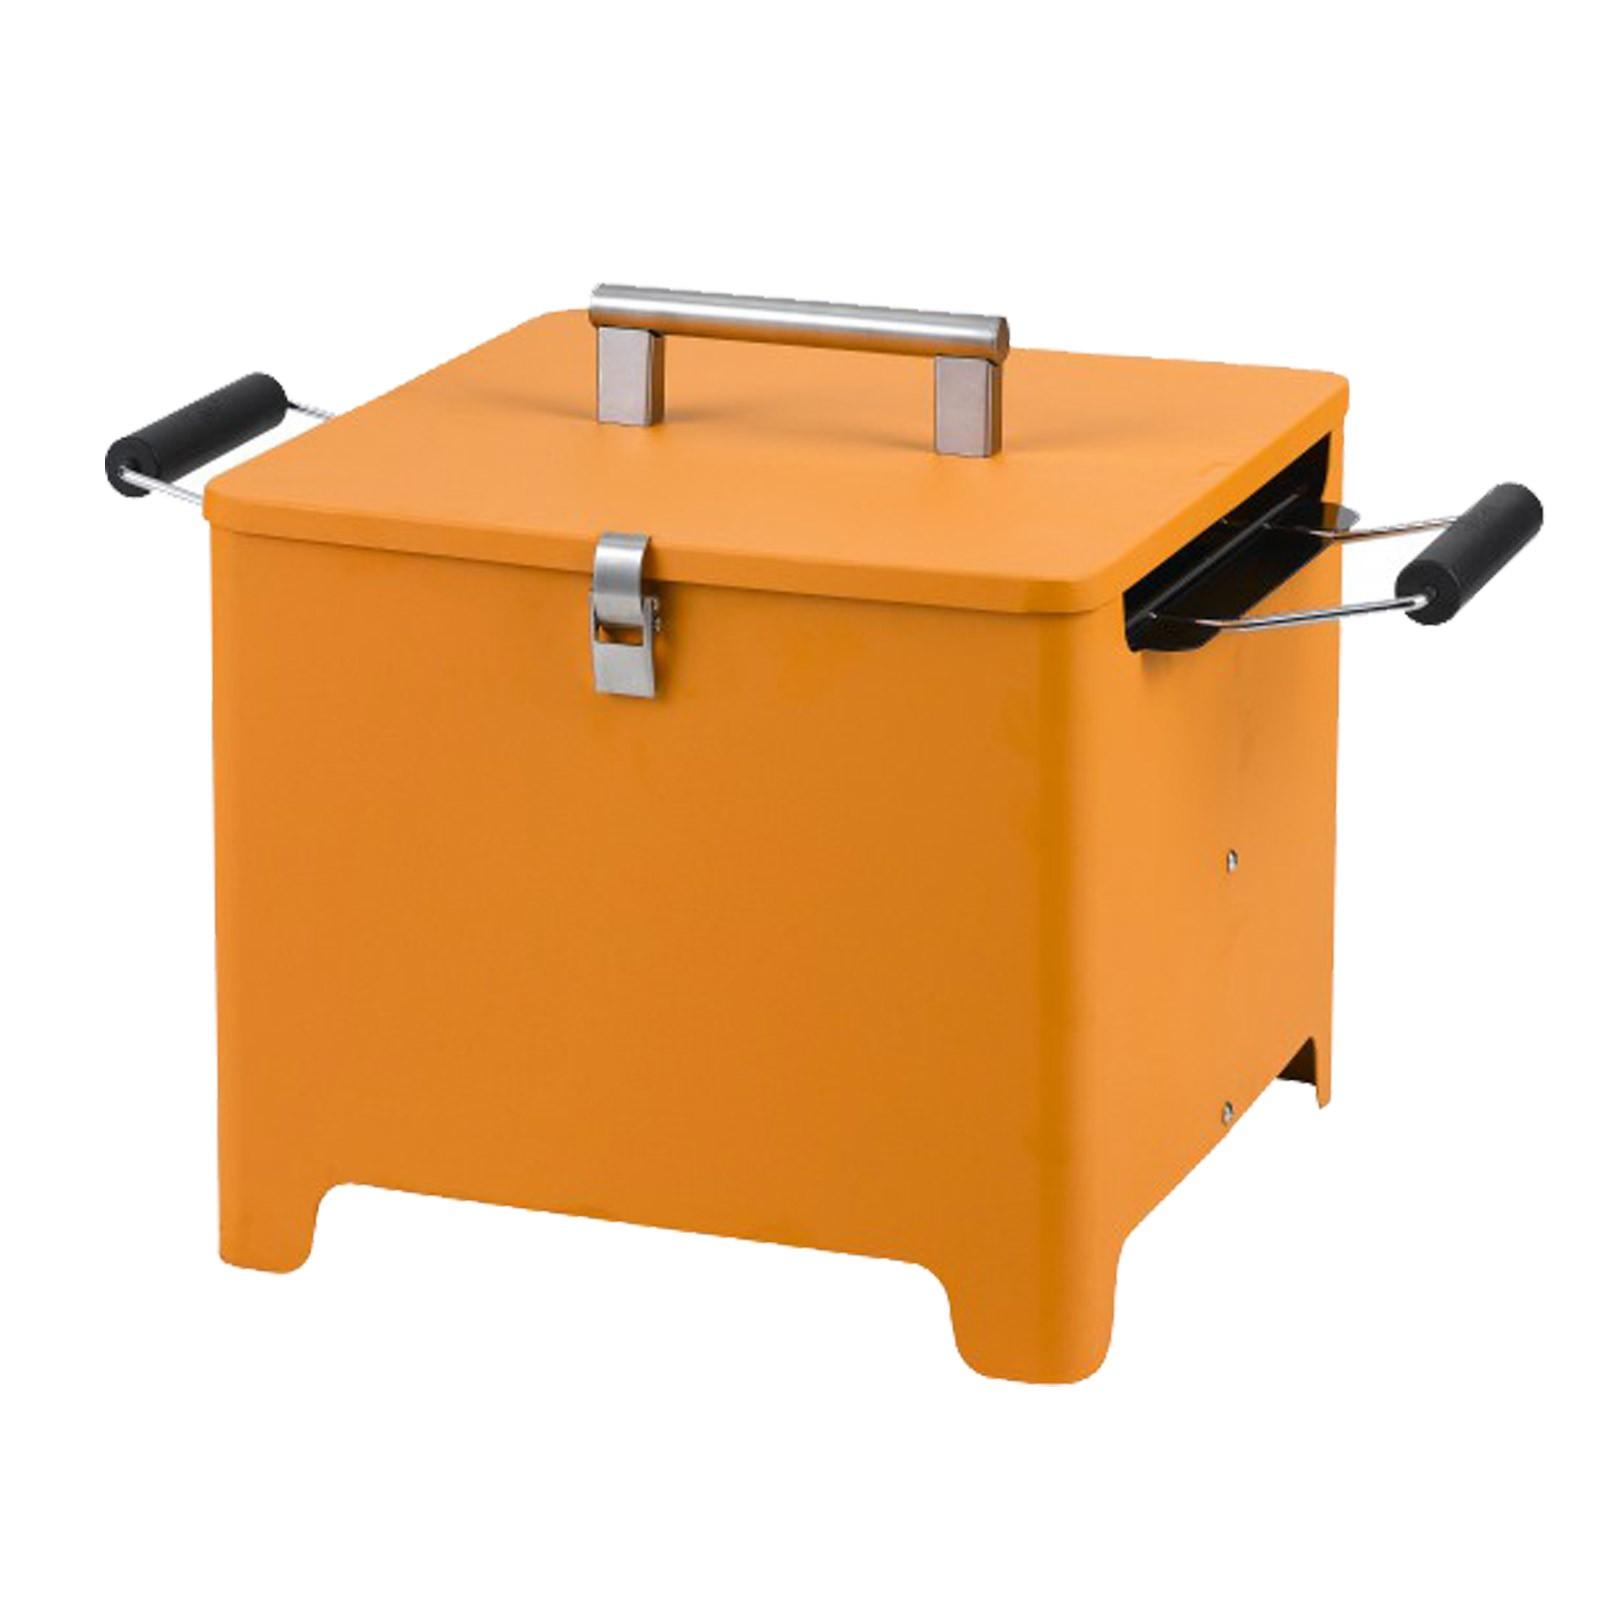 Tepro Chill&Grill Holzkohlegrill Cube orange 1144